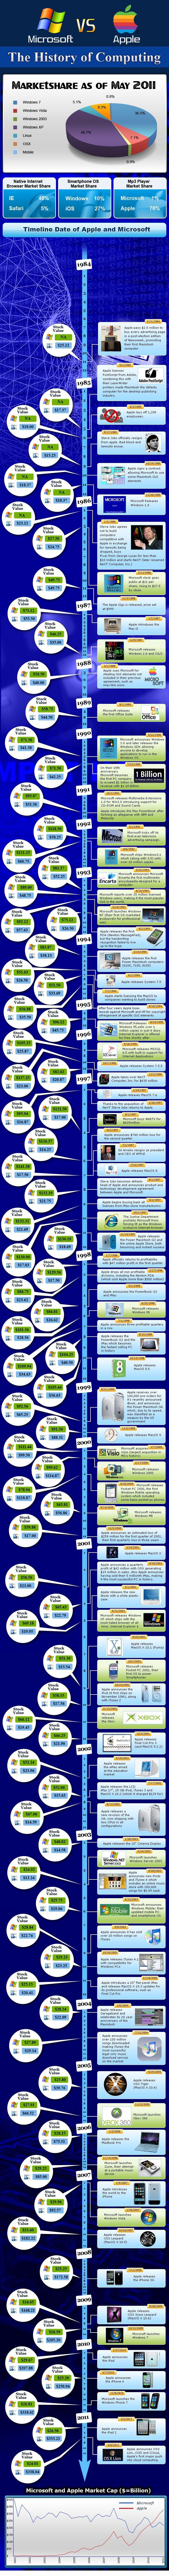 Apple-vs-Microsoft-infographic